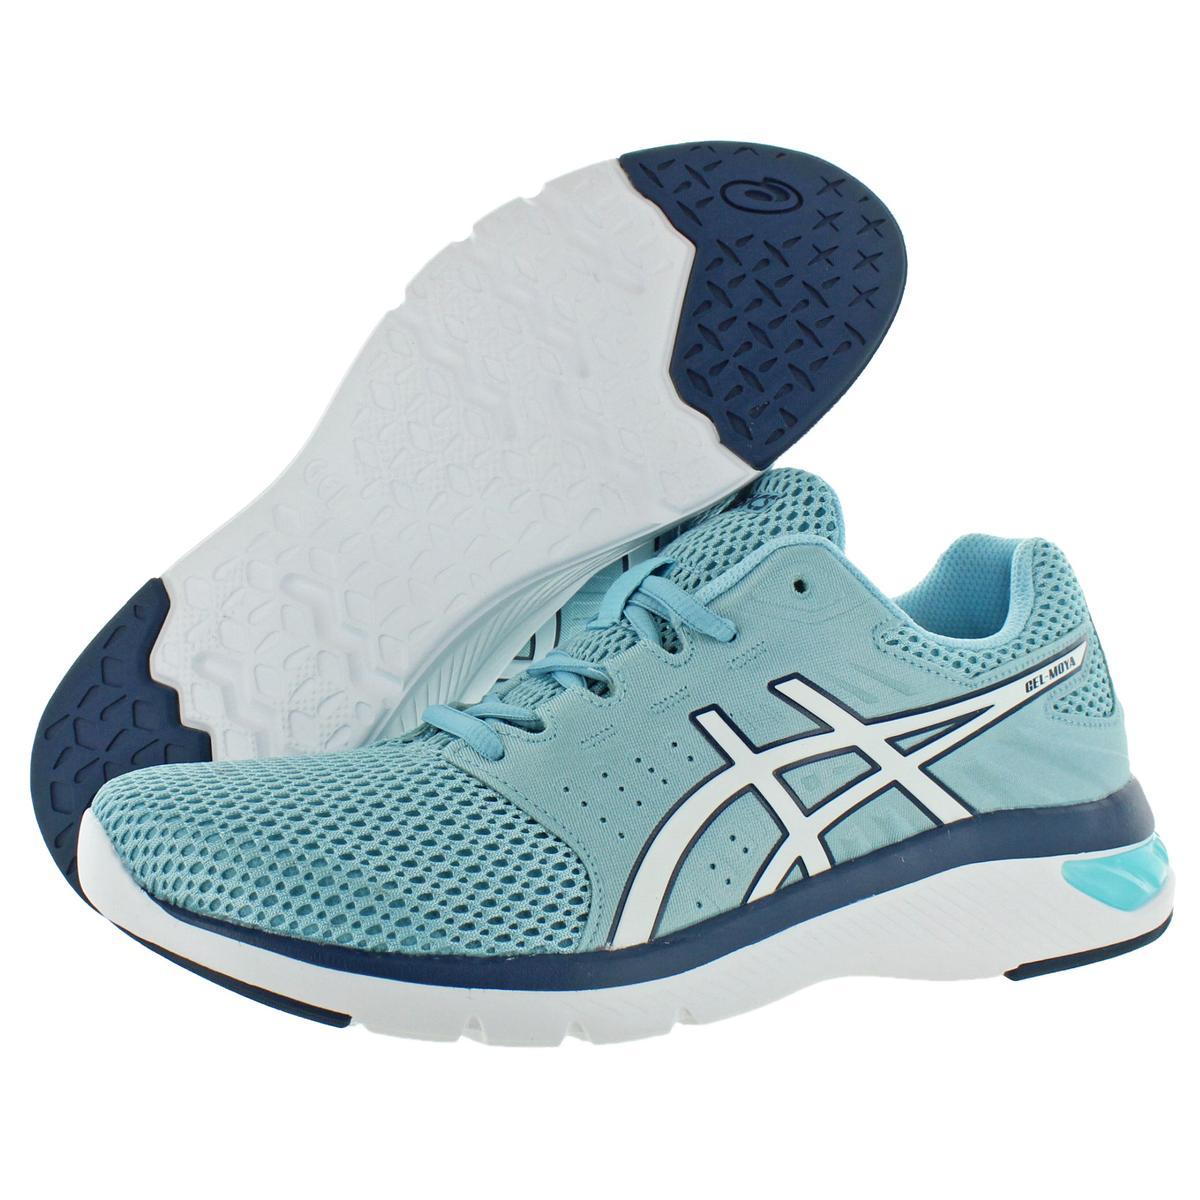 Asics-Womens-Gel-Moya-Blue-Running-Shoes-Sneakers-12-Medium-B-M-BHFO-5296 thumbnail 6